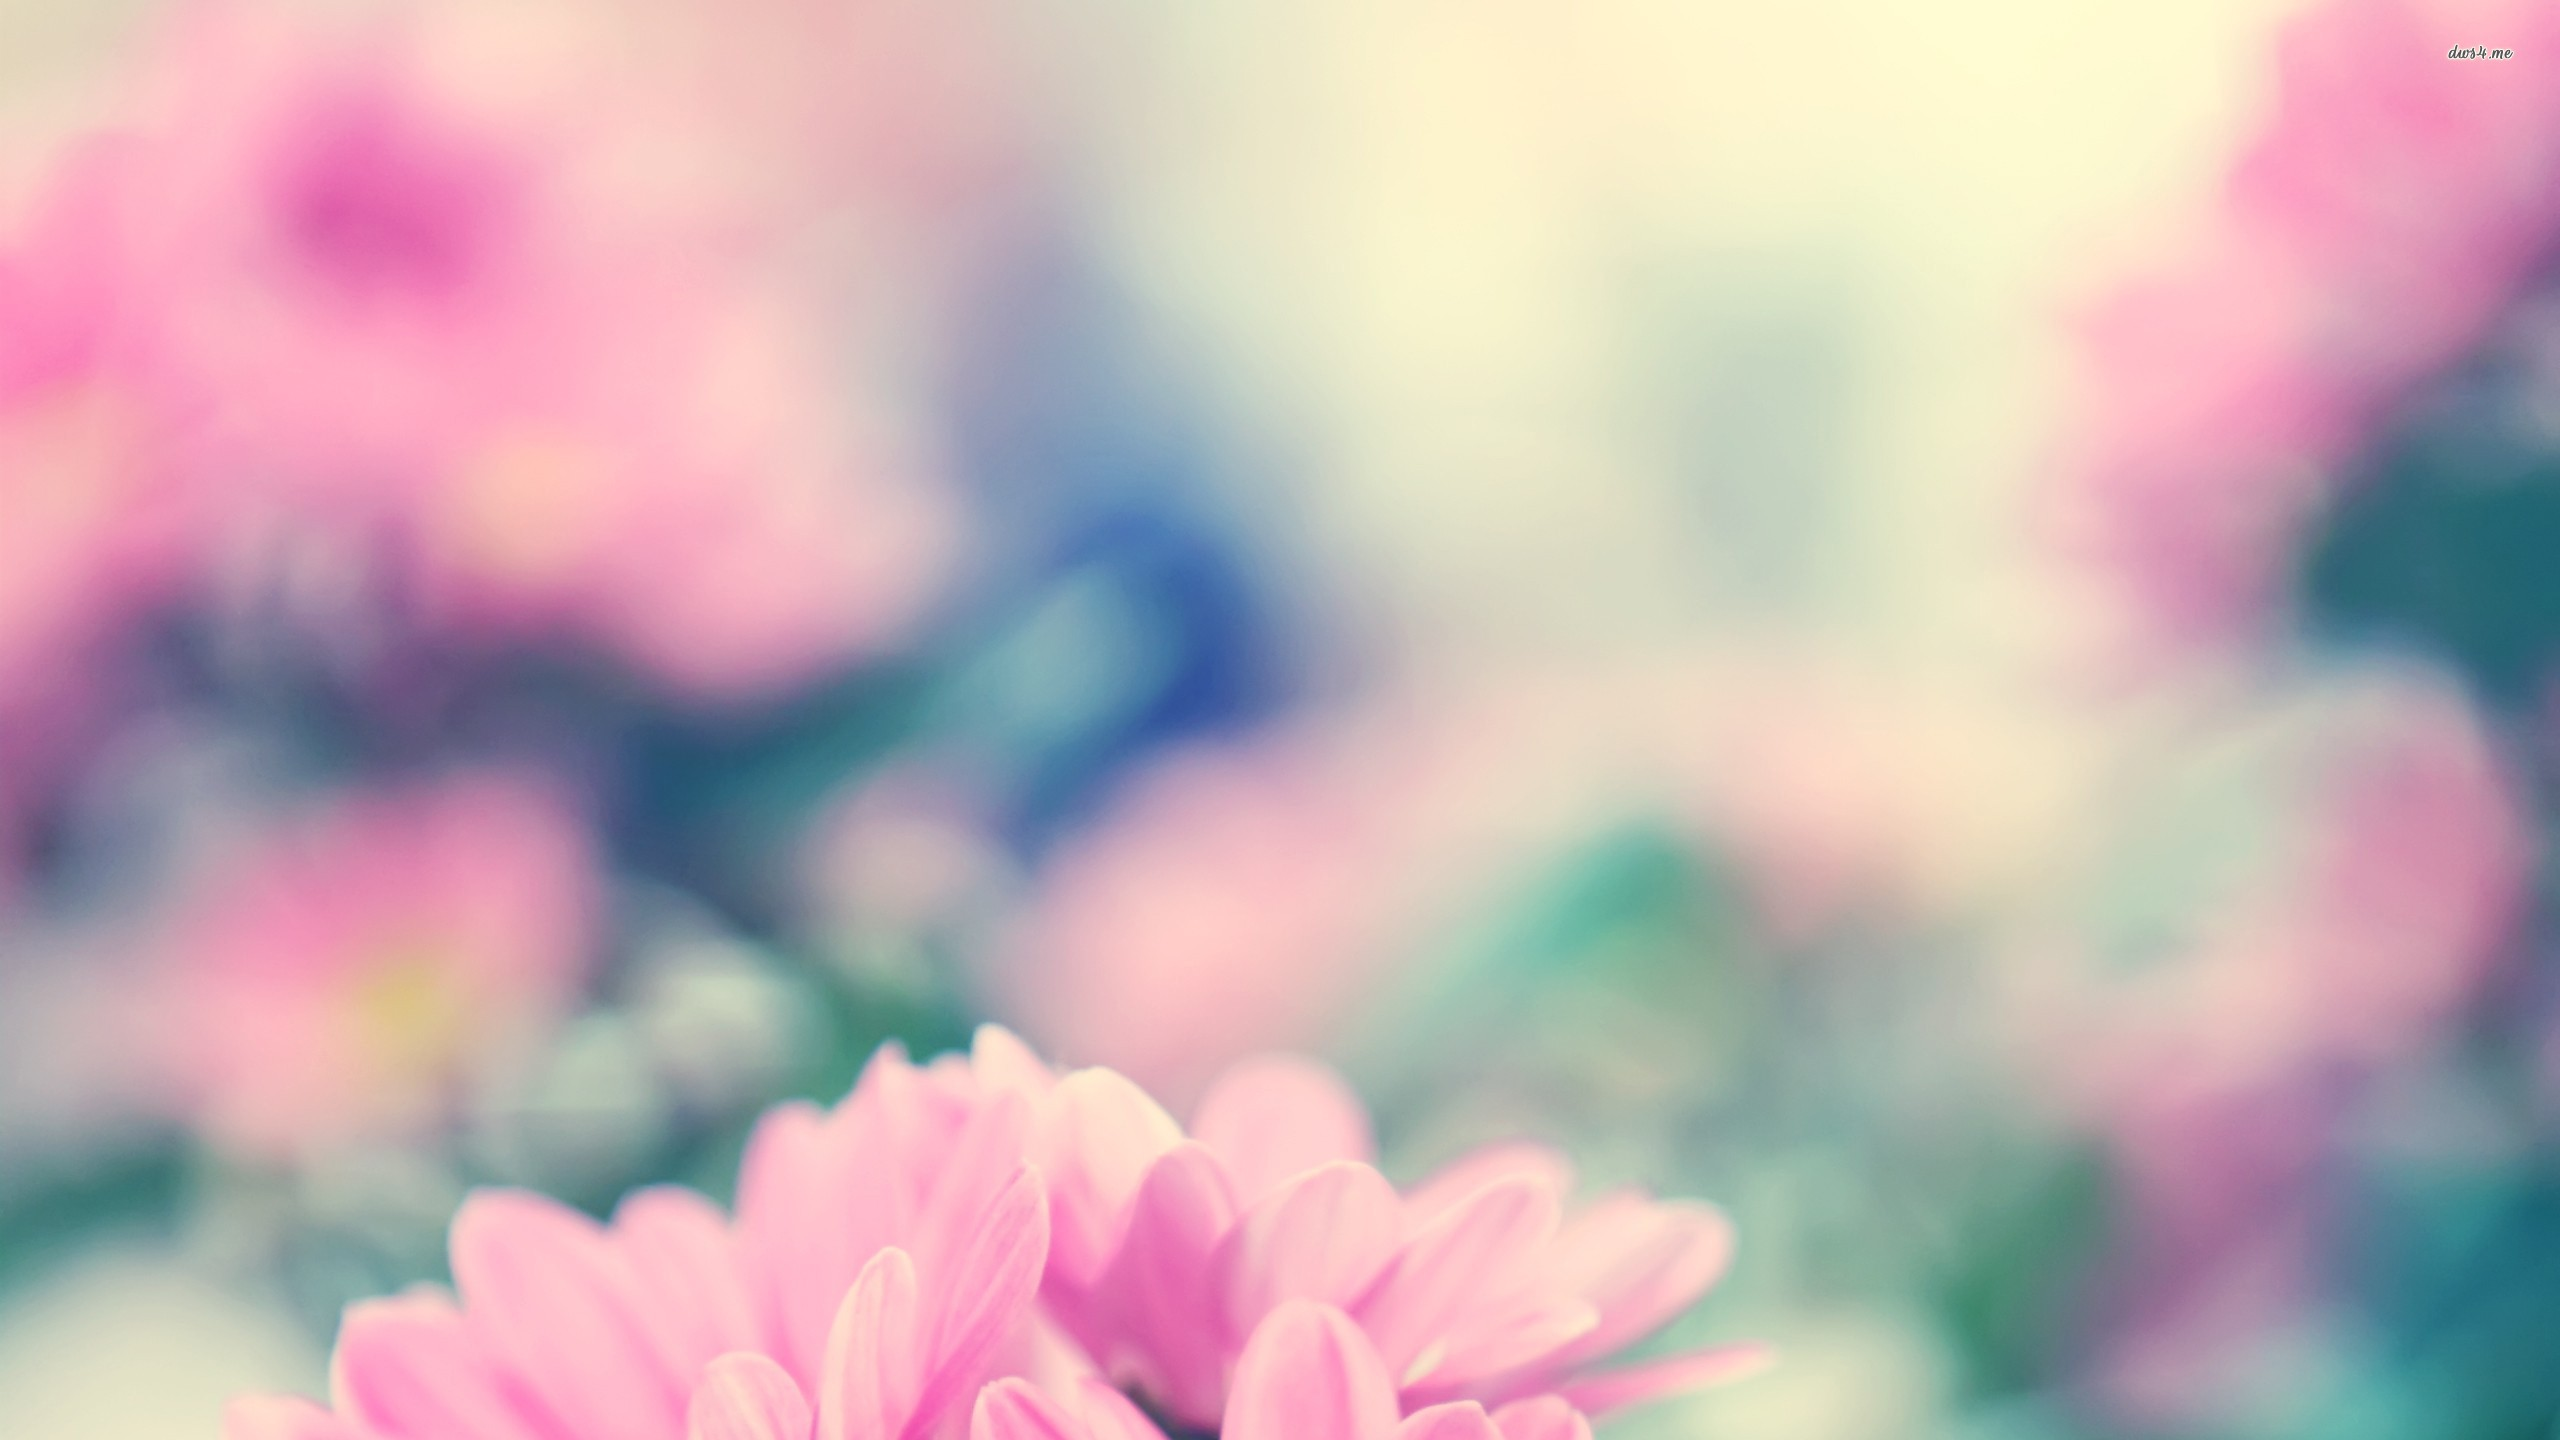 Daisies Tumblr Wallpaper Pink daisies wallpaper 2560x1440